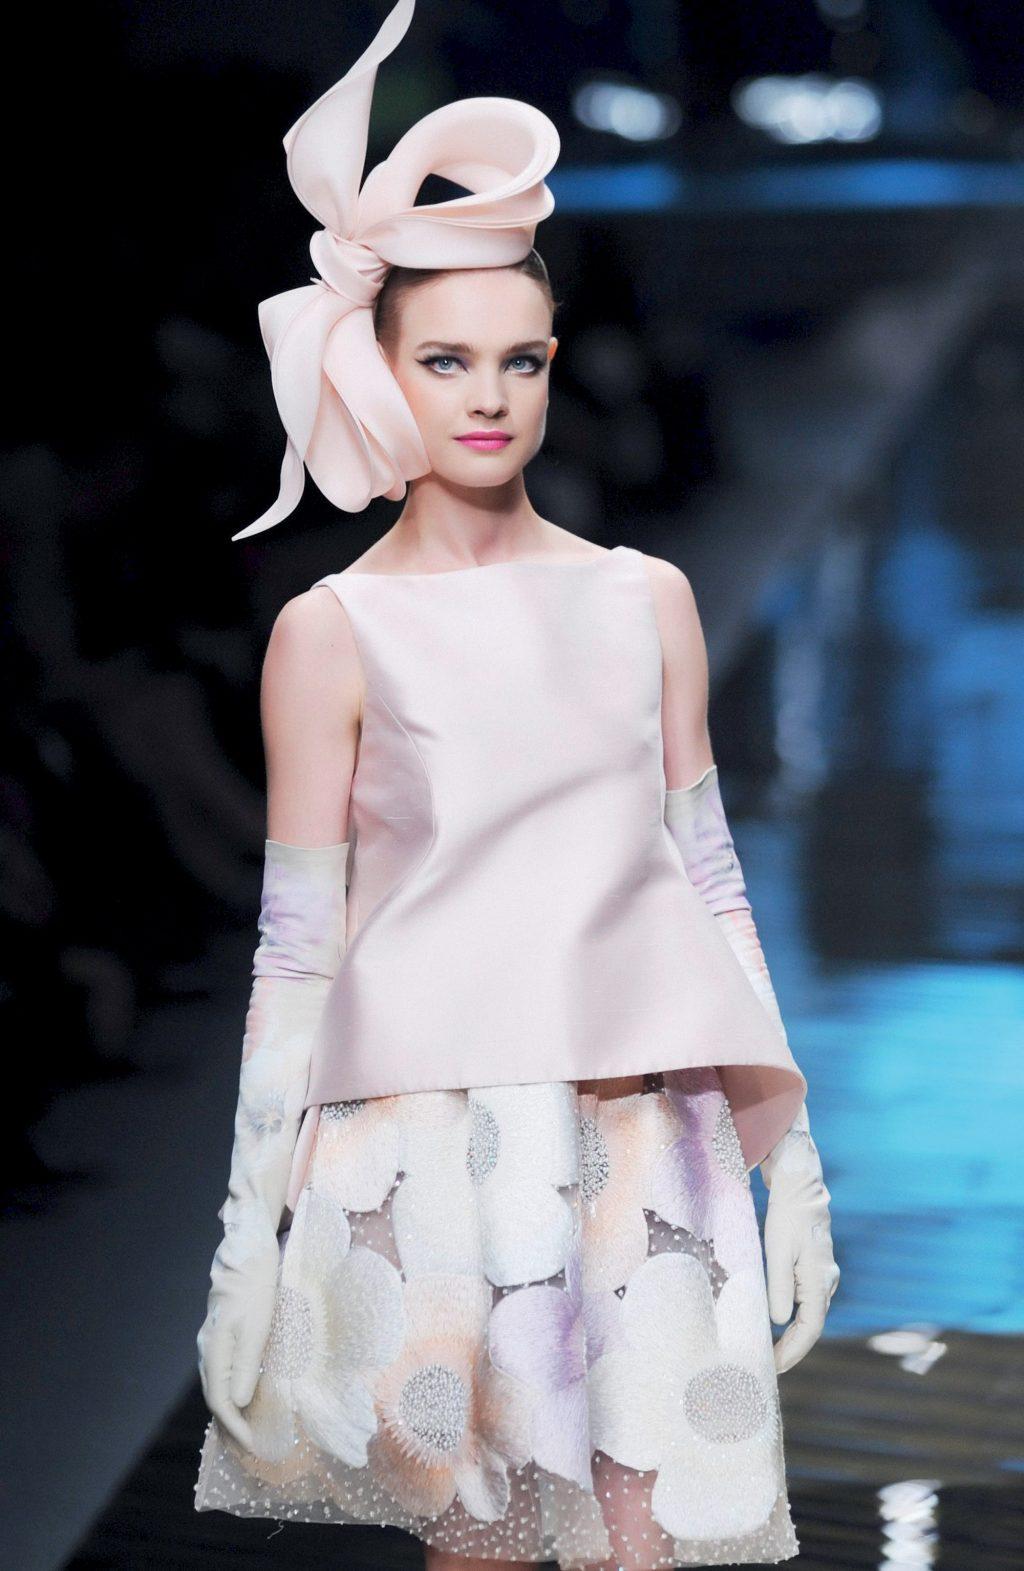 Natalia Vodianova sở hữu dáng ngọc sau sinh